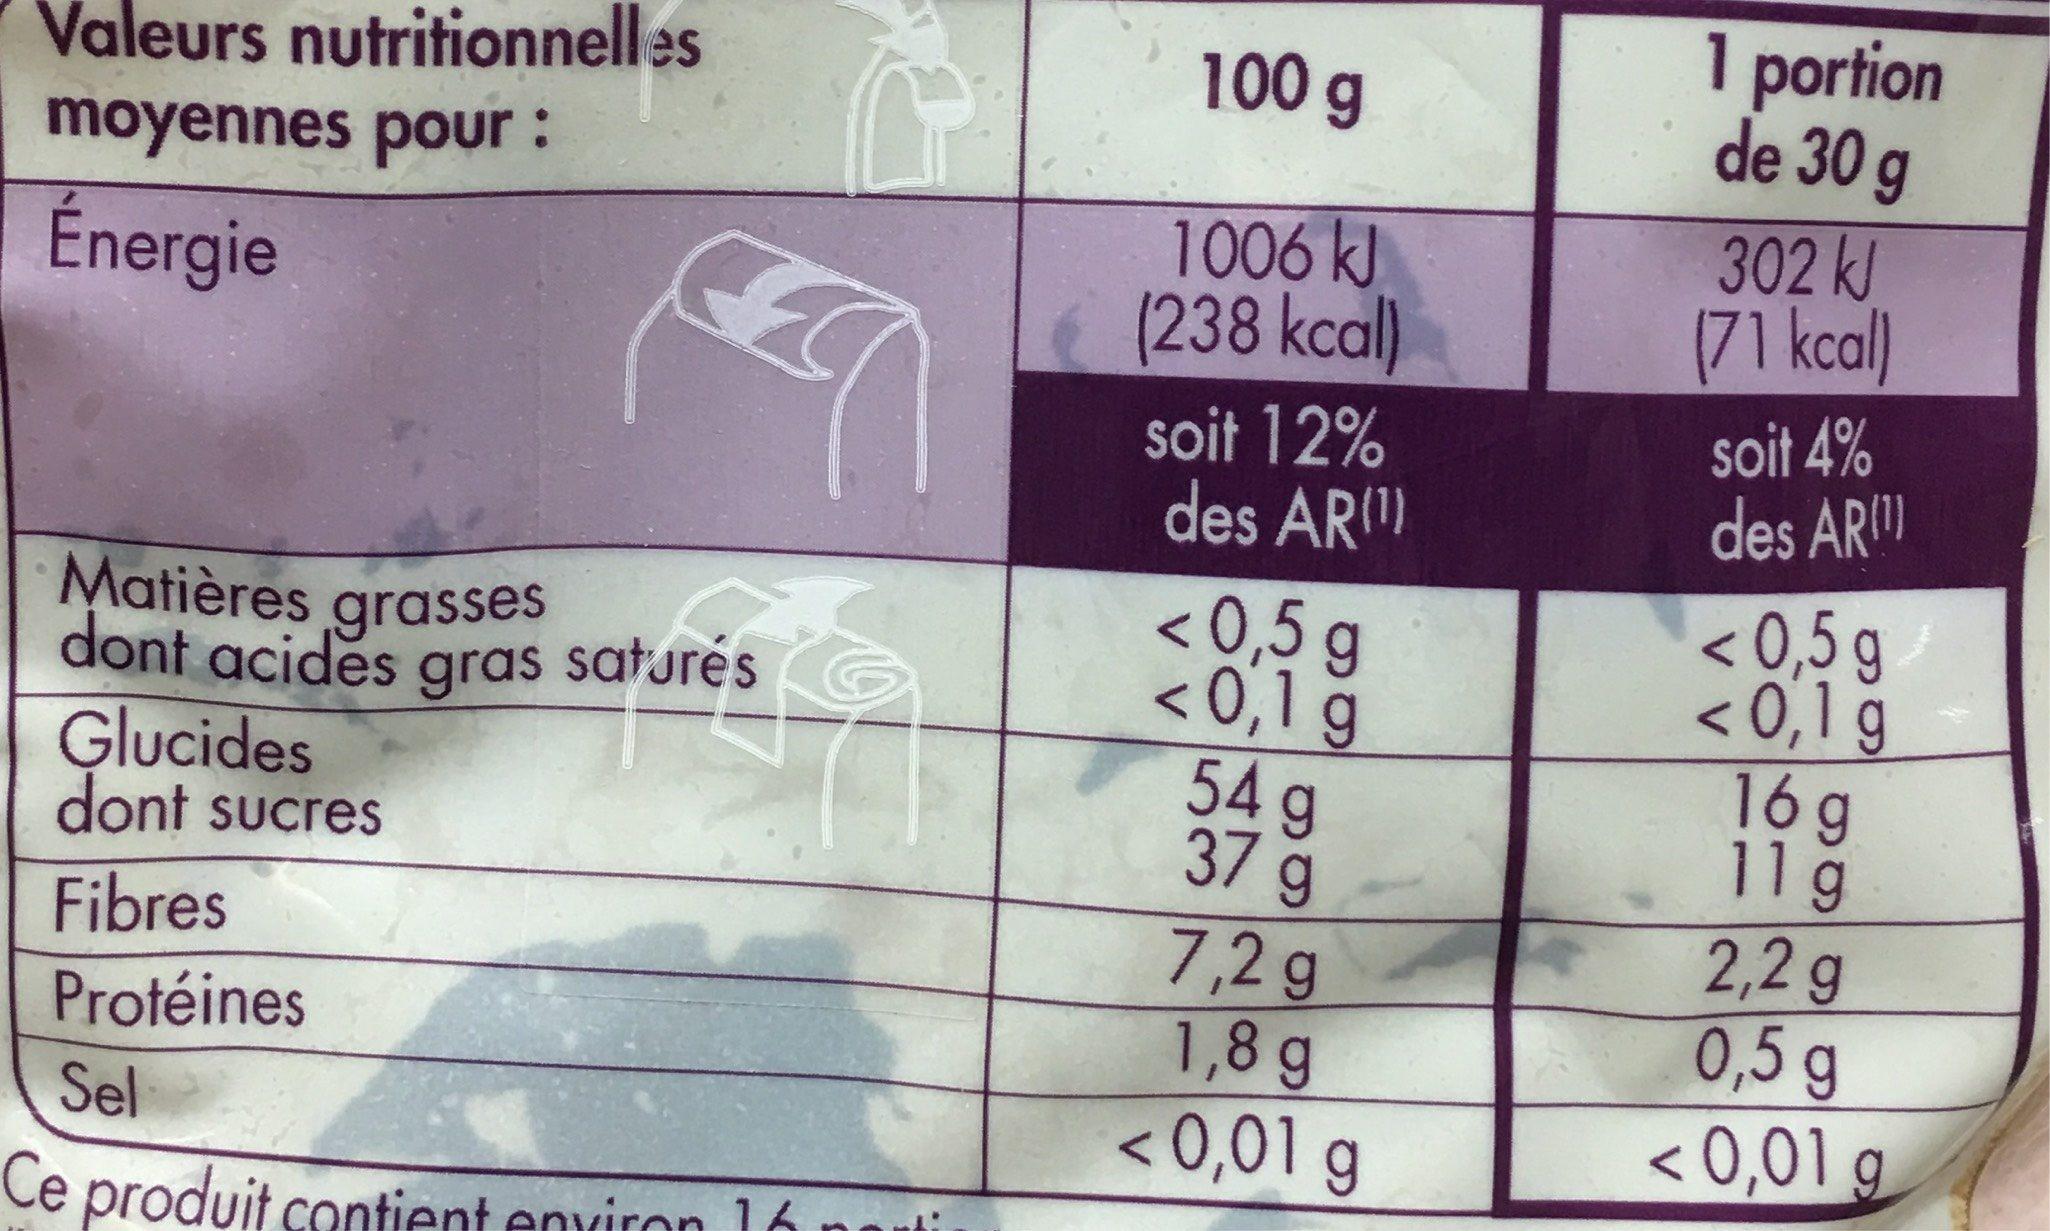 Pruneaux d'agen geant entiers ids - Información nutricional - fr